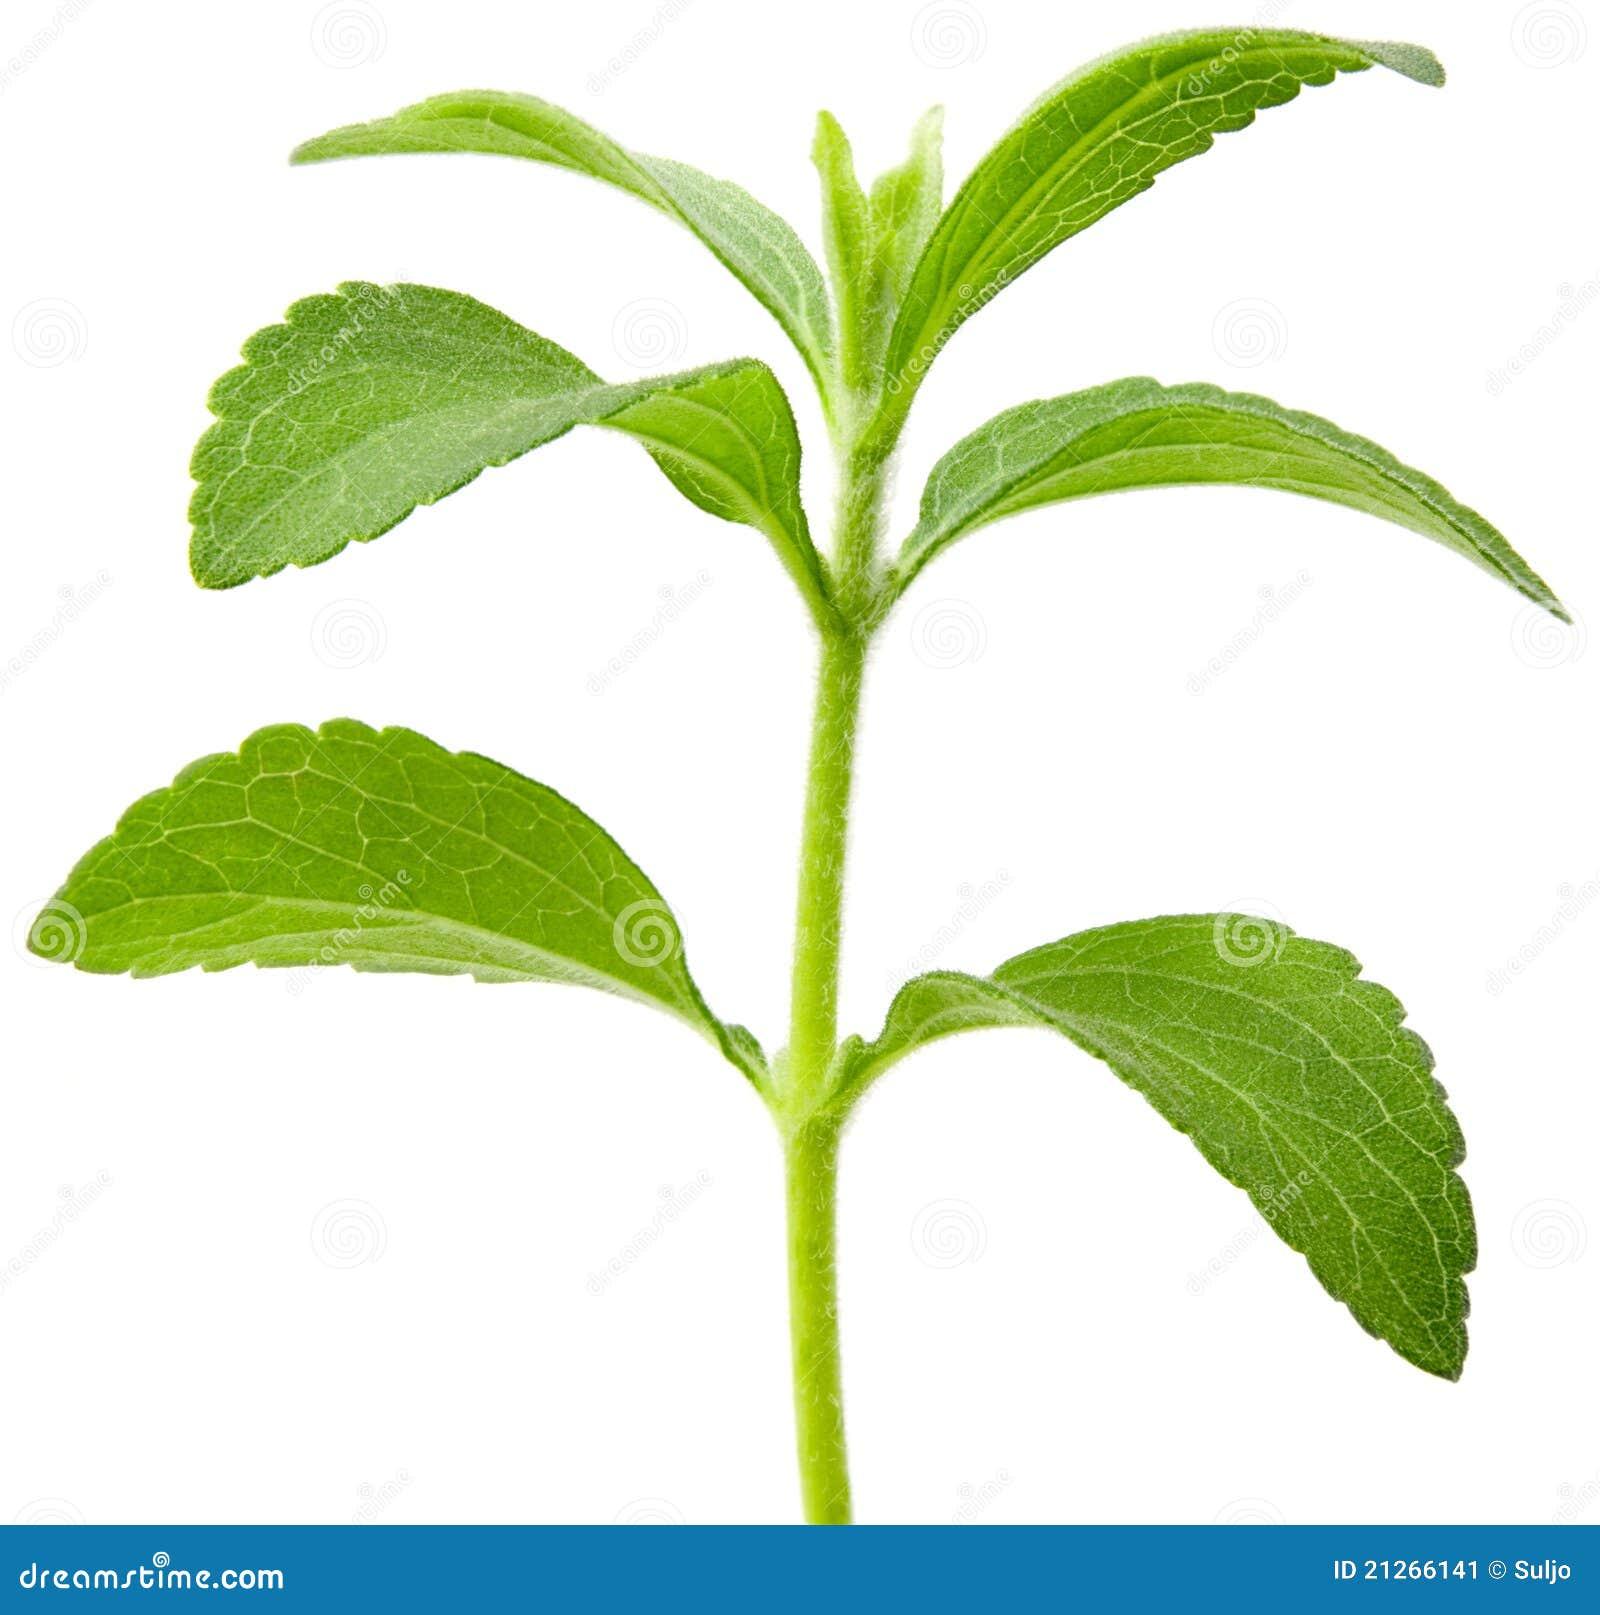 recorte de la planta del stevia imagen de archivo imagen 21266141. Black Bedroom Furniture Sets. Home Design Ideas